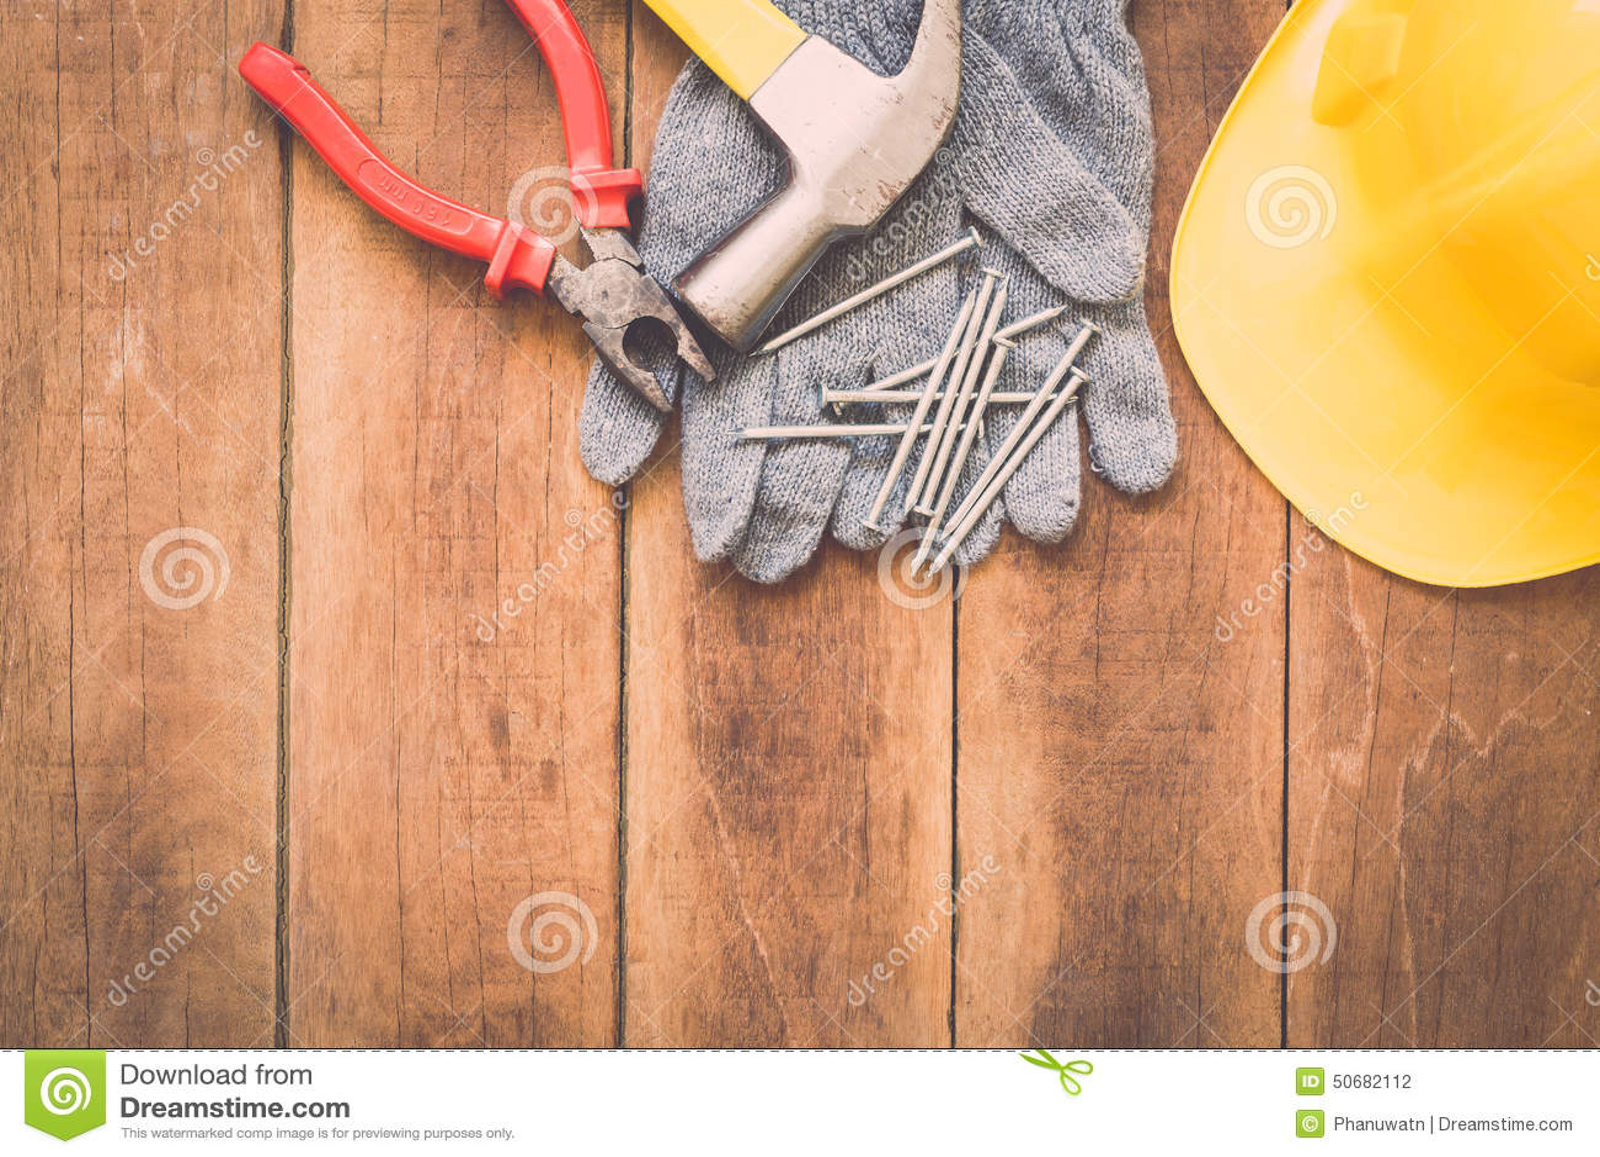 Download 在木头的被分类的工作工具 库存照片. 图片 包括有 木料, 材料, 建筑, brusher, 特写镜头, 投反对票 - 50682112